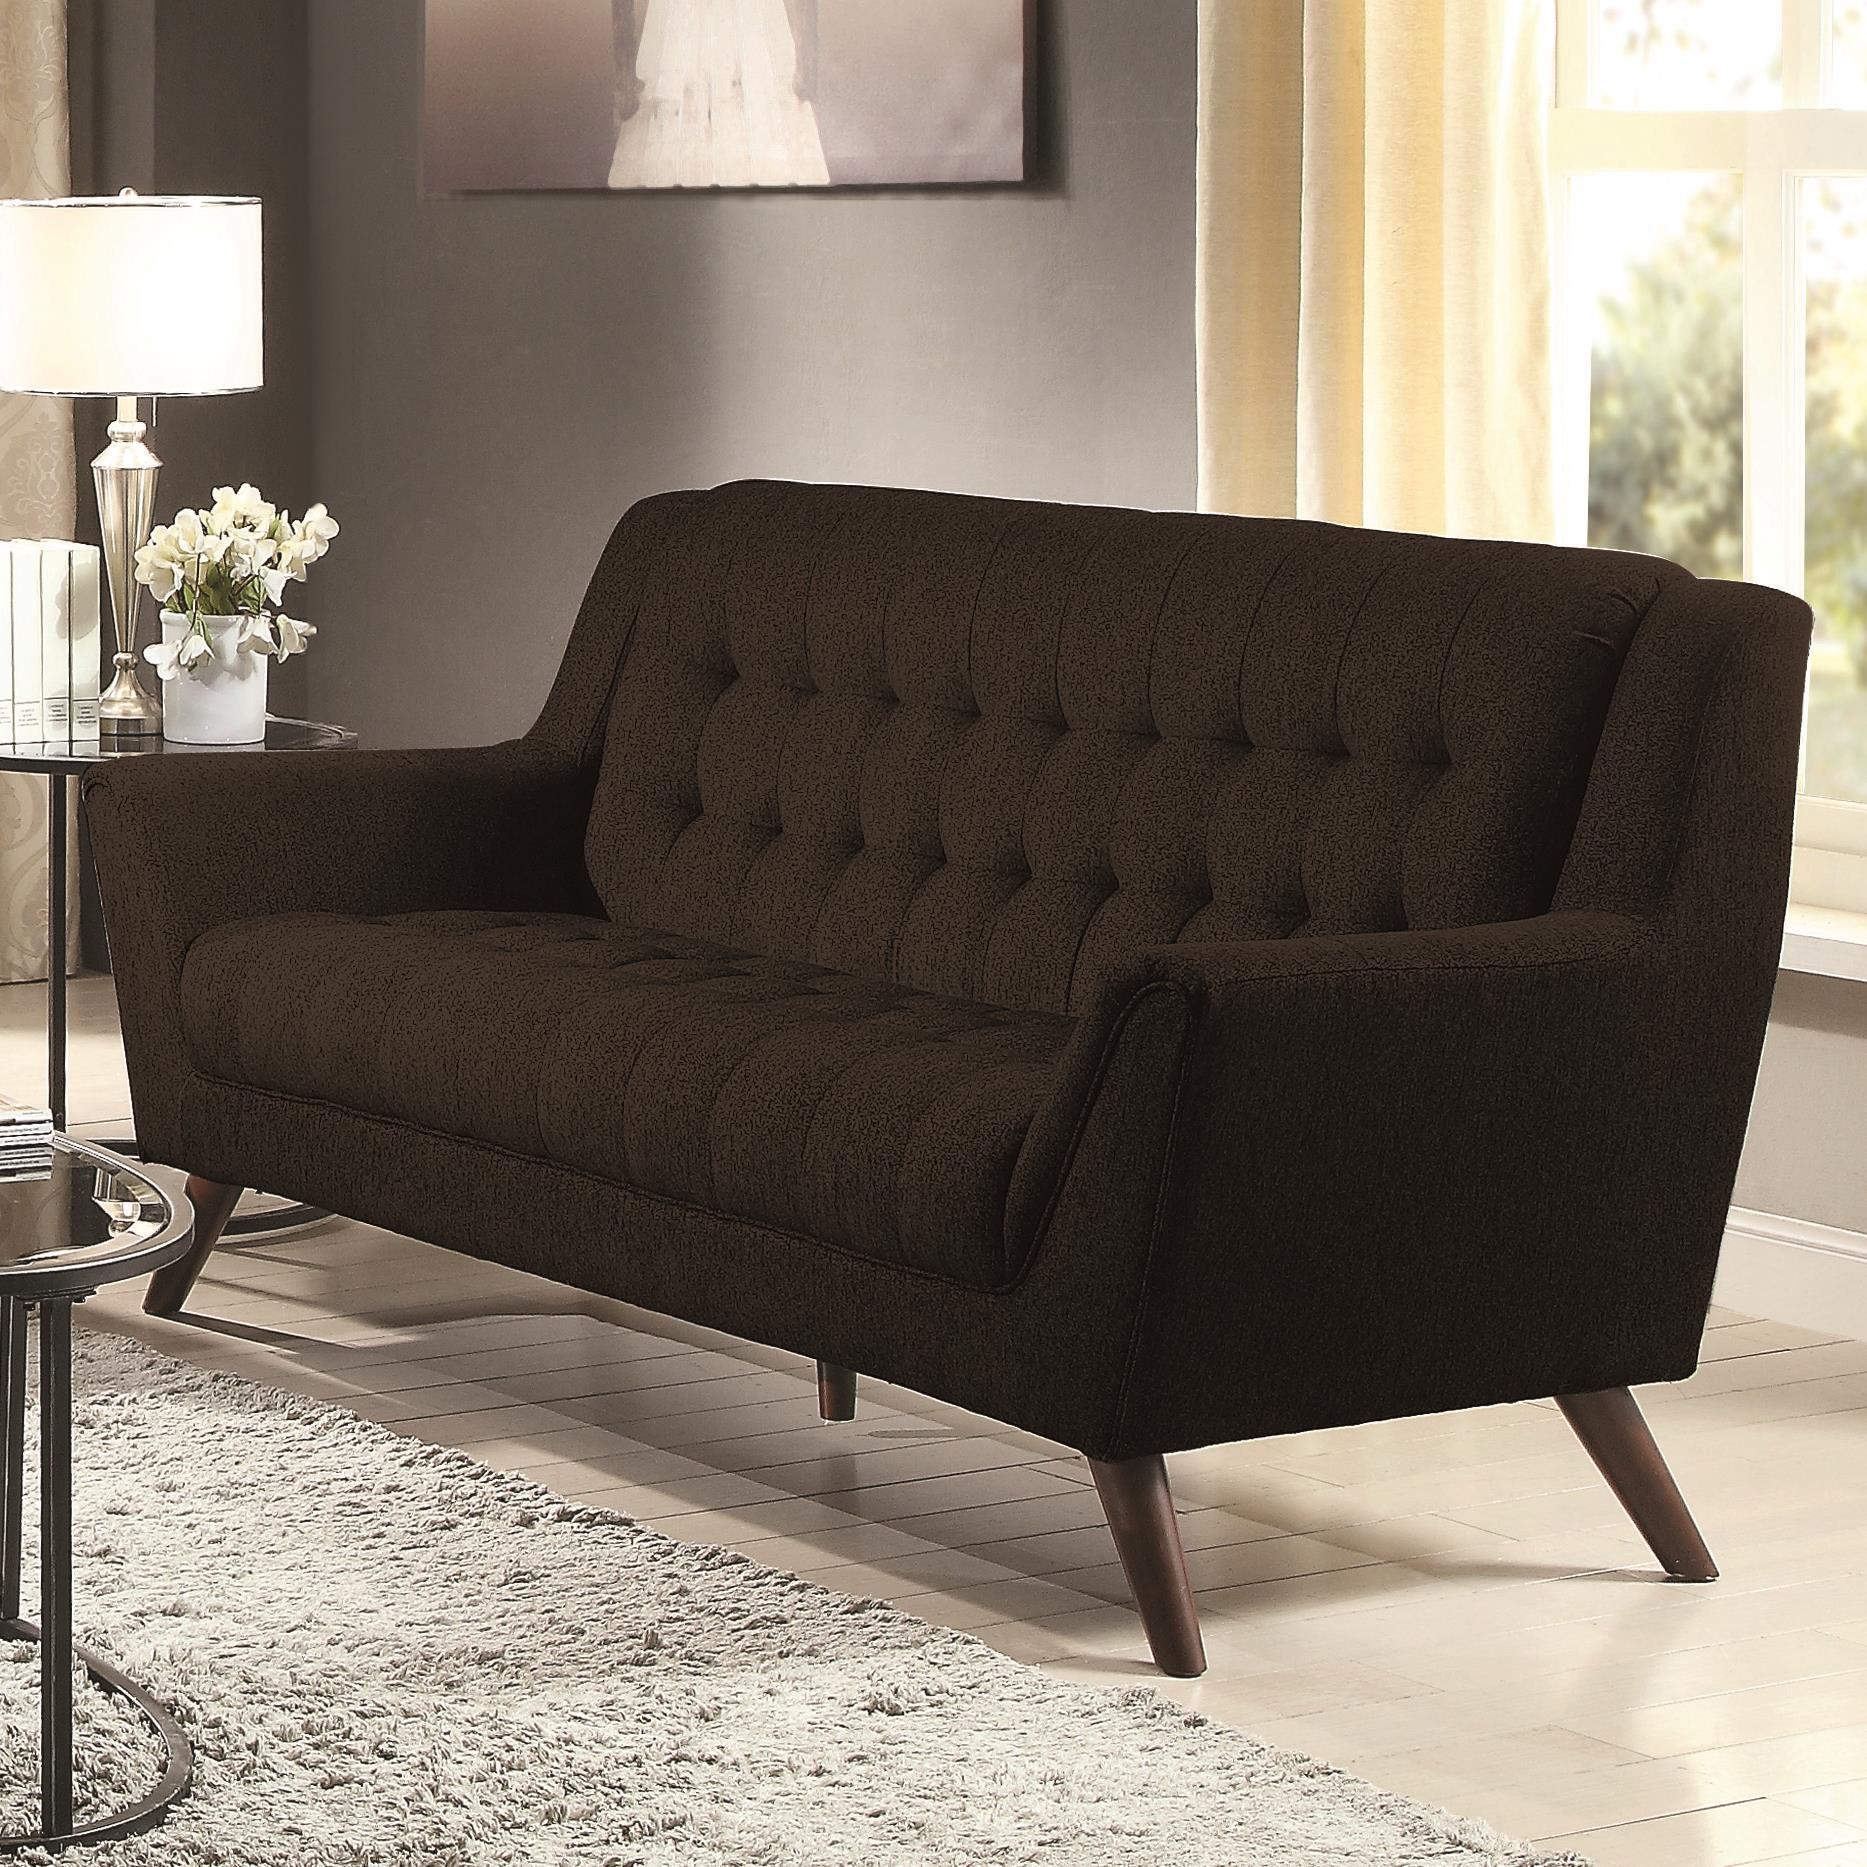 century furniture sofa quality beds hk baby natalia mid modern